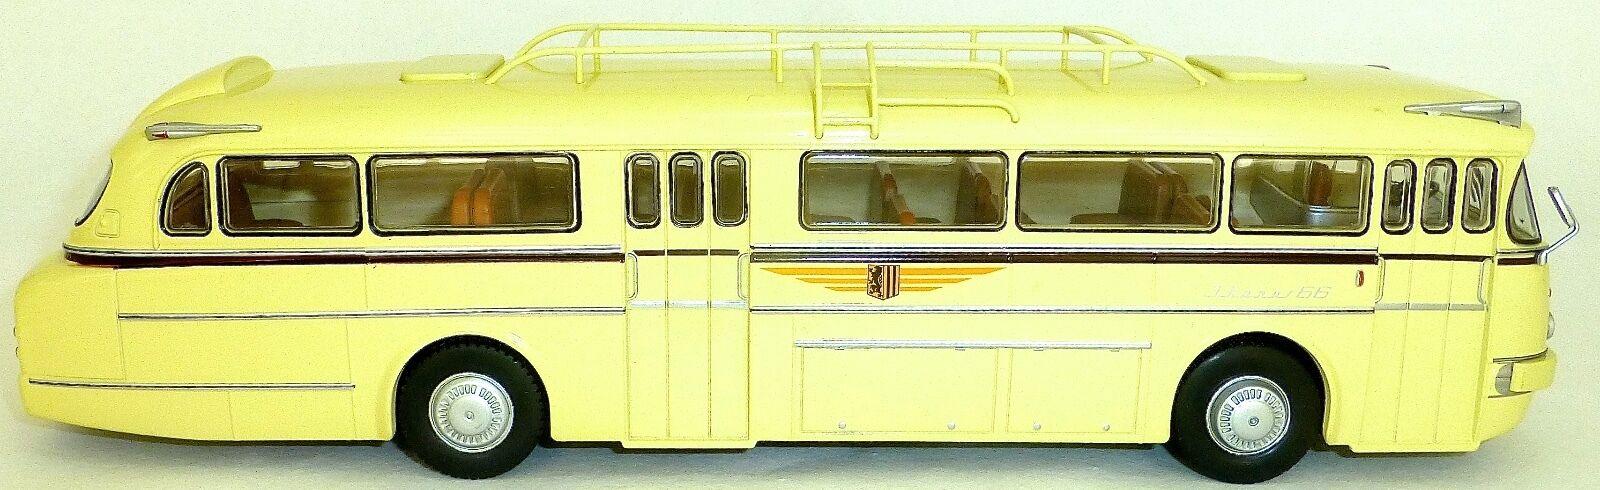 Ikarus 66 bus dvb dresden ixo 1 43 neuf et emball é ha2 µ